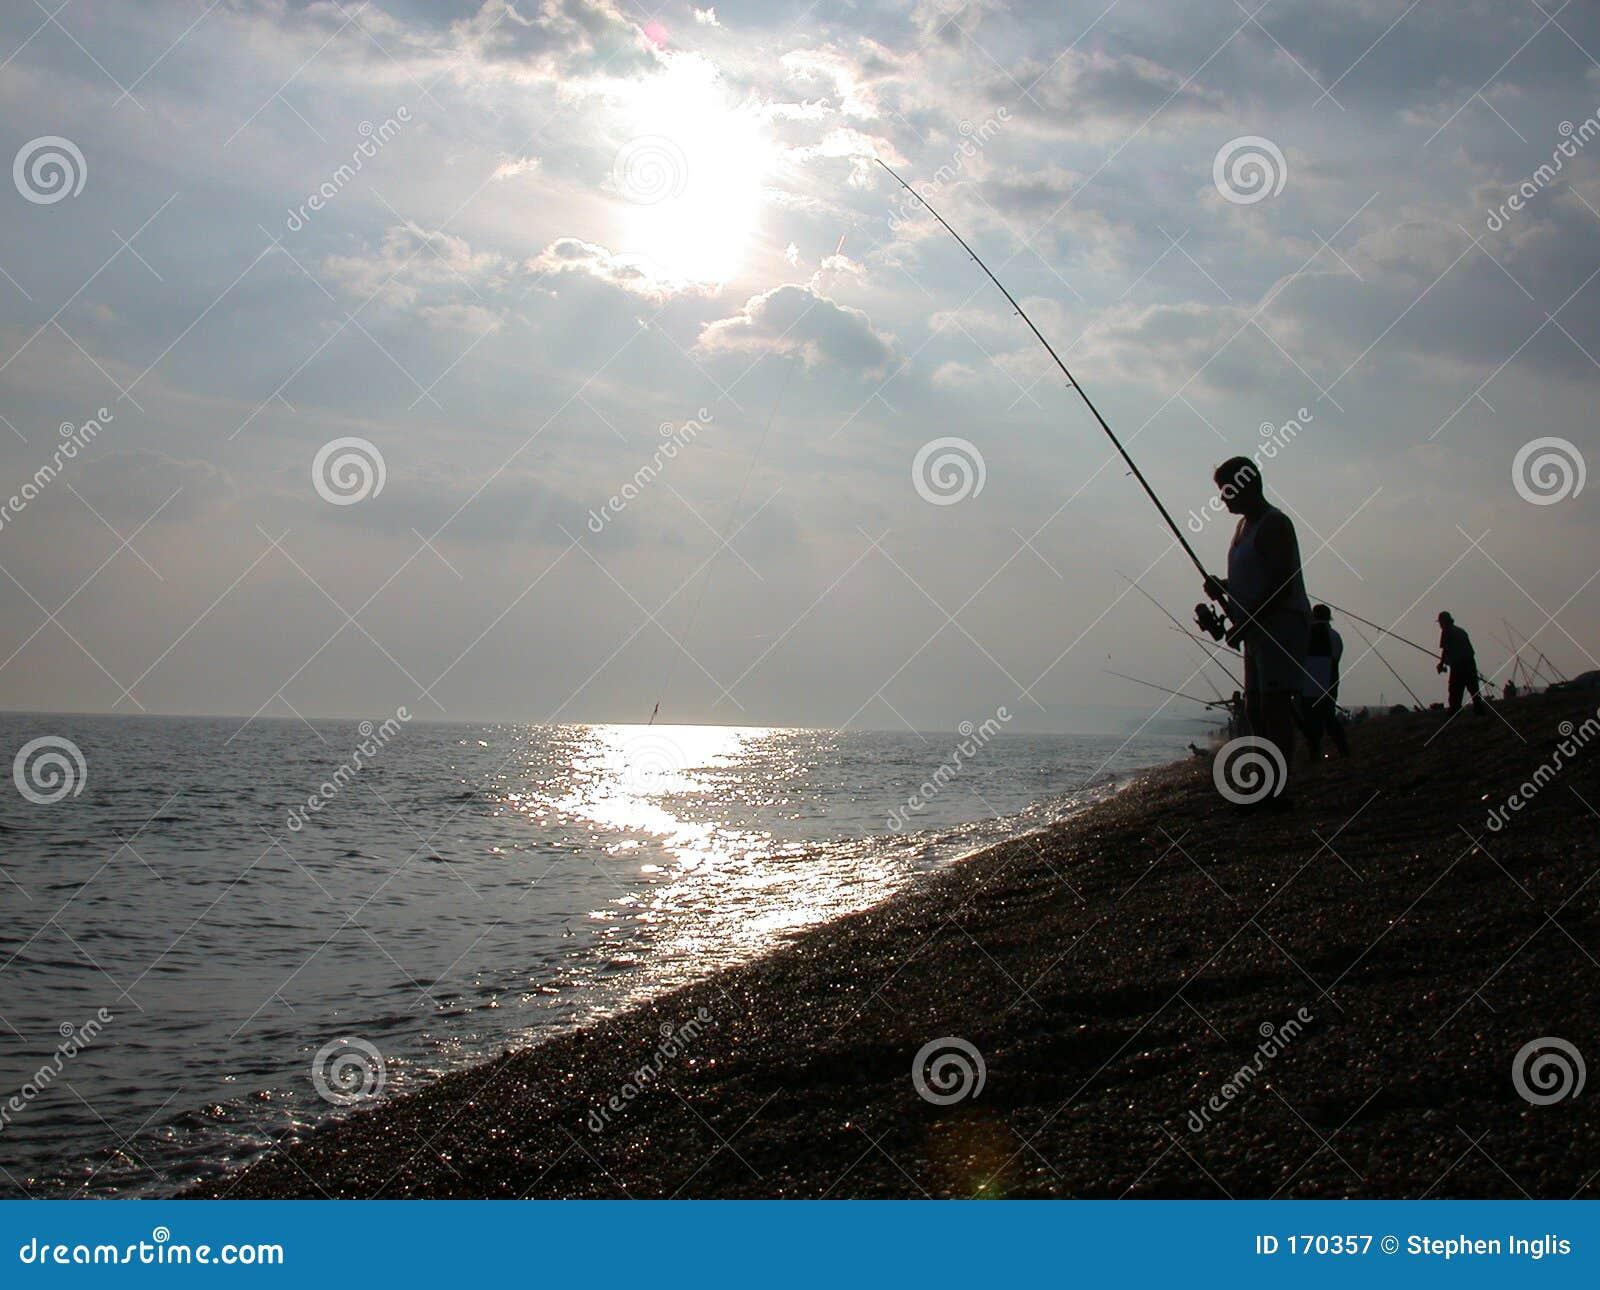 Fishing on the coast 1